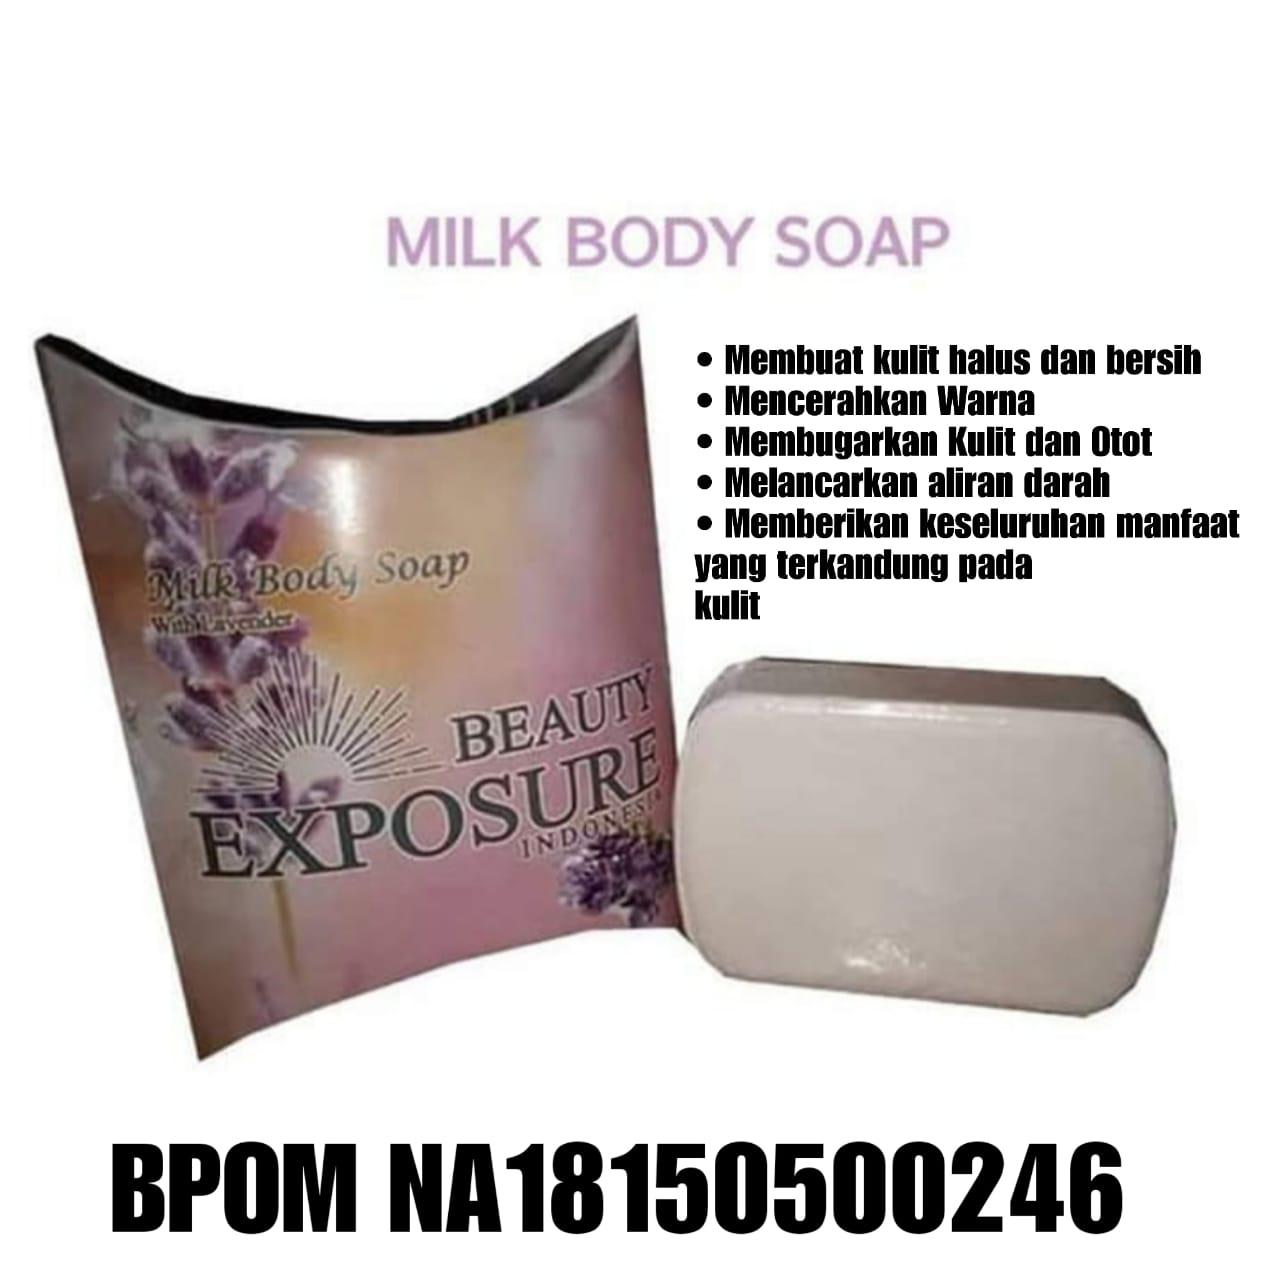 Beauty Exposure Indonesia